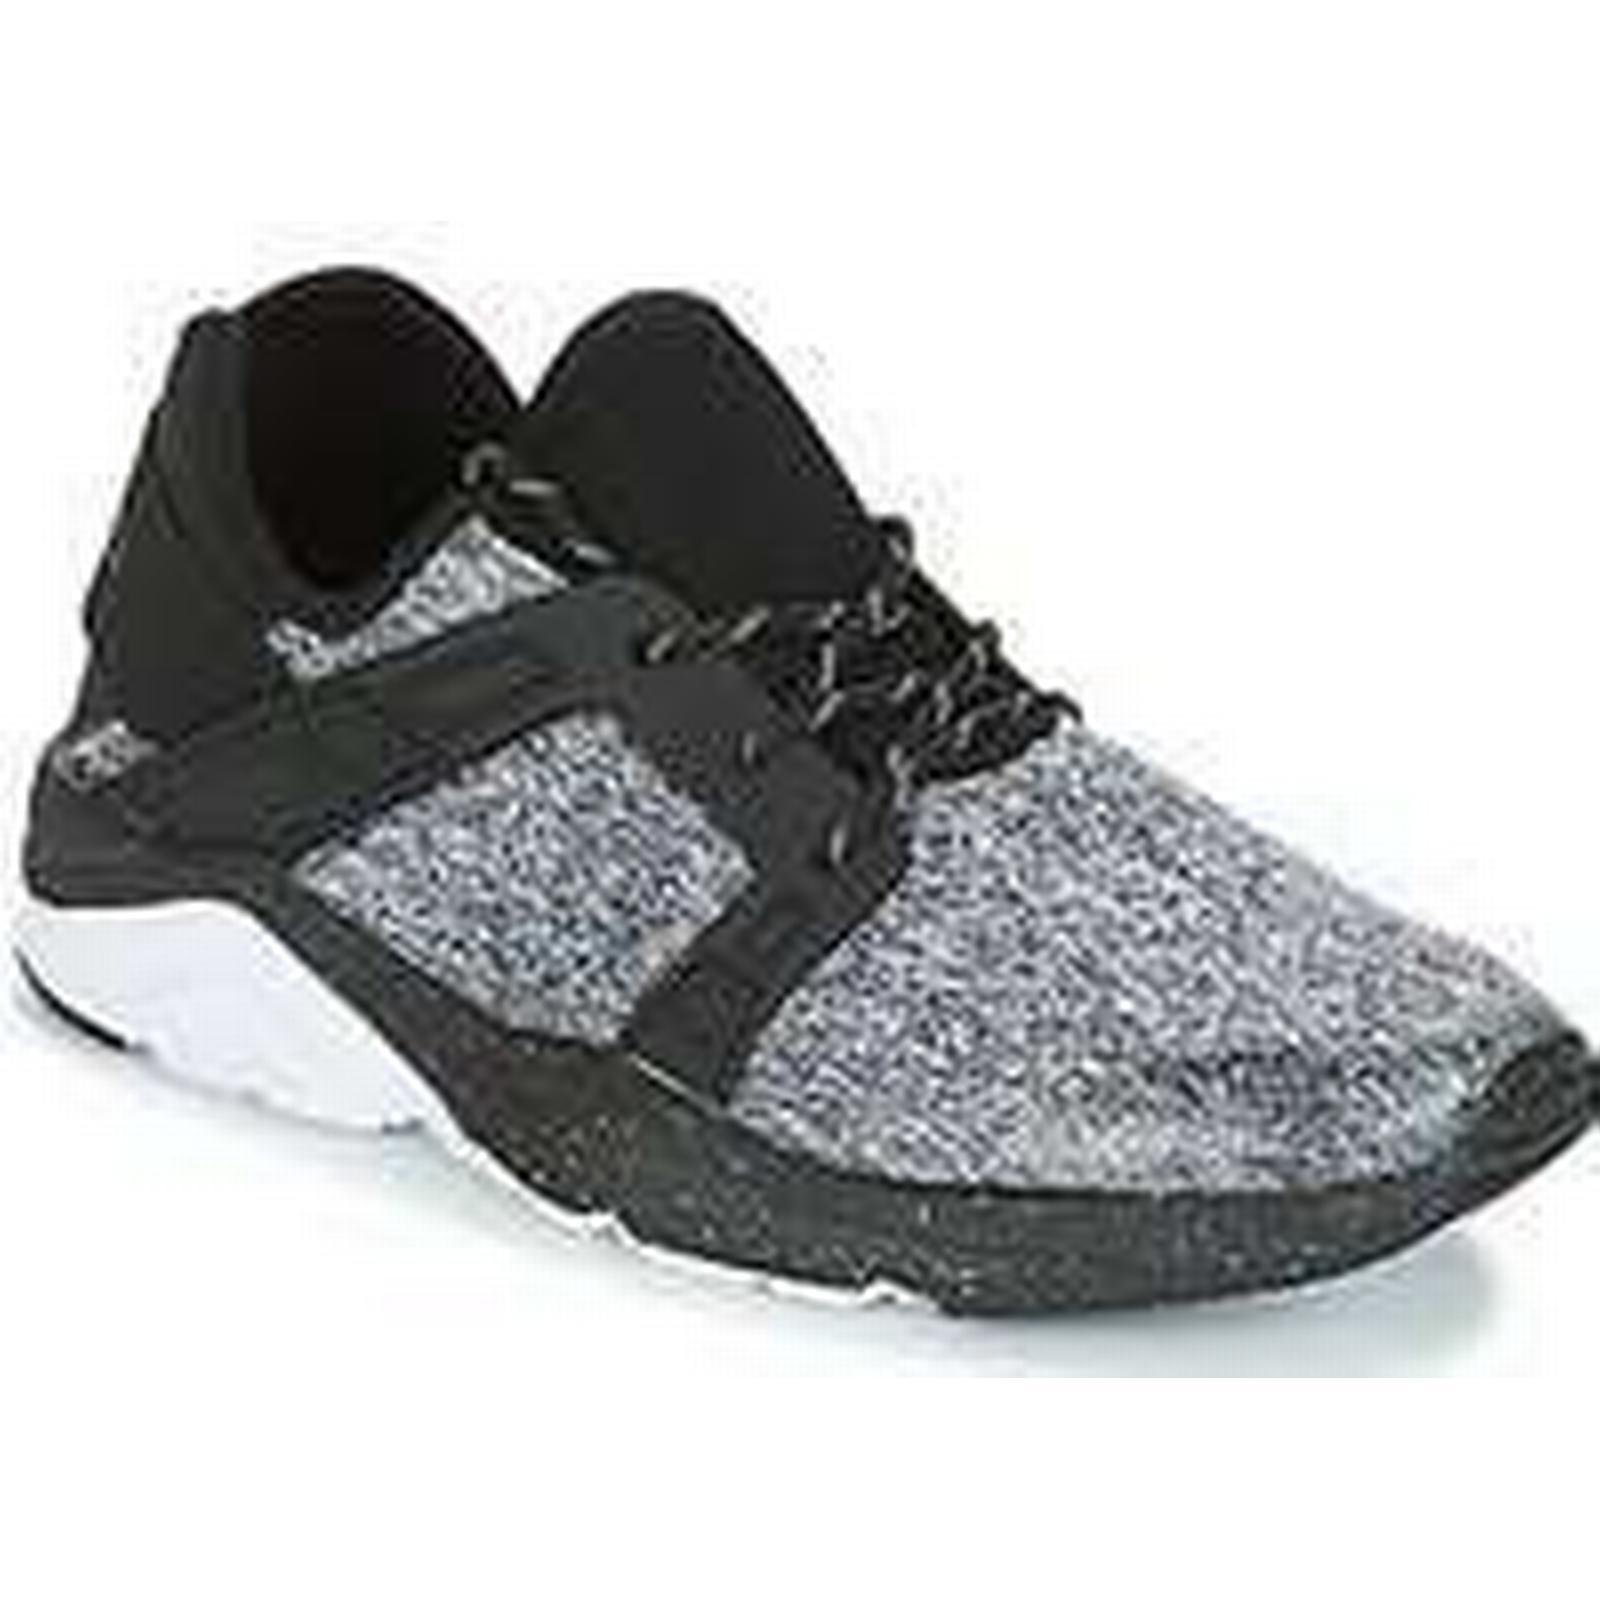 Spartoo.co.uk Shoes Kappa SAN FERNANDO men's Shoes Spartoo.co.uk (Trainers) in Black 55591b